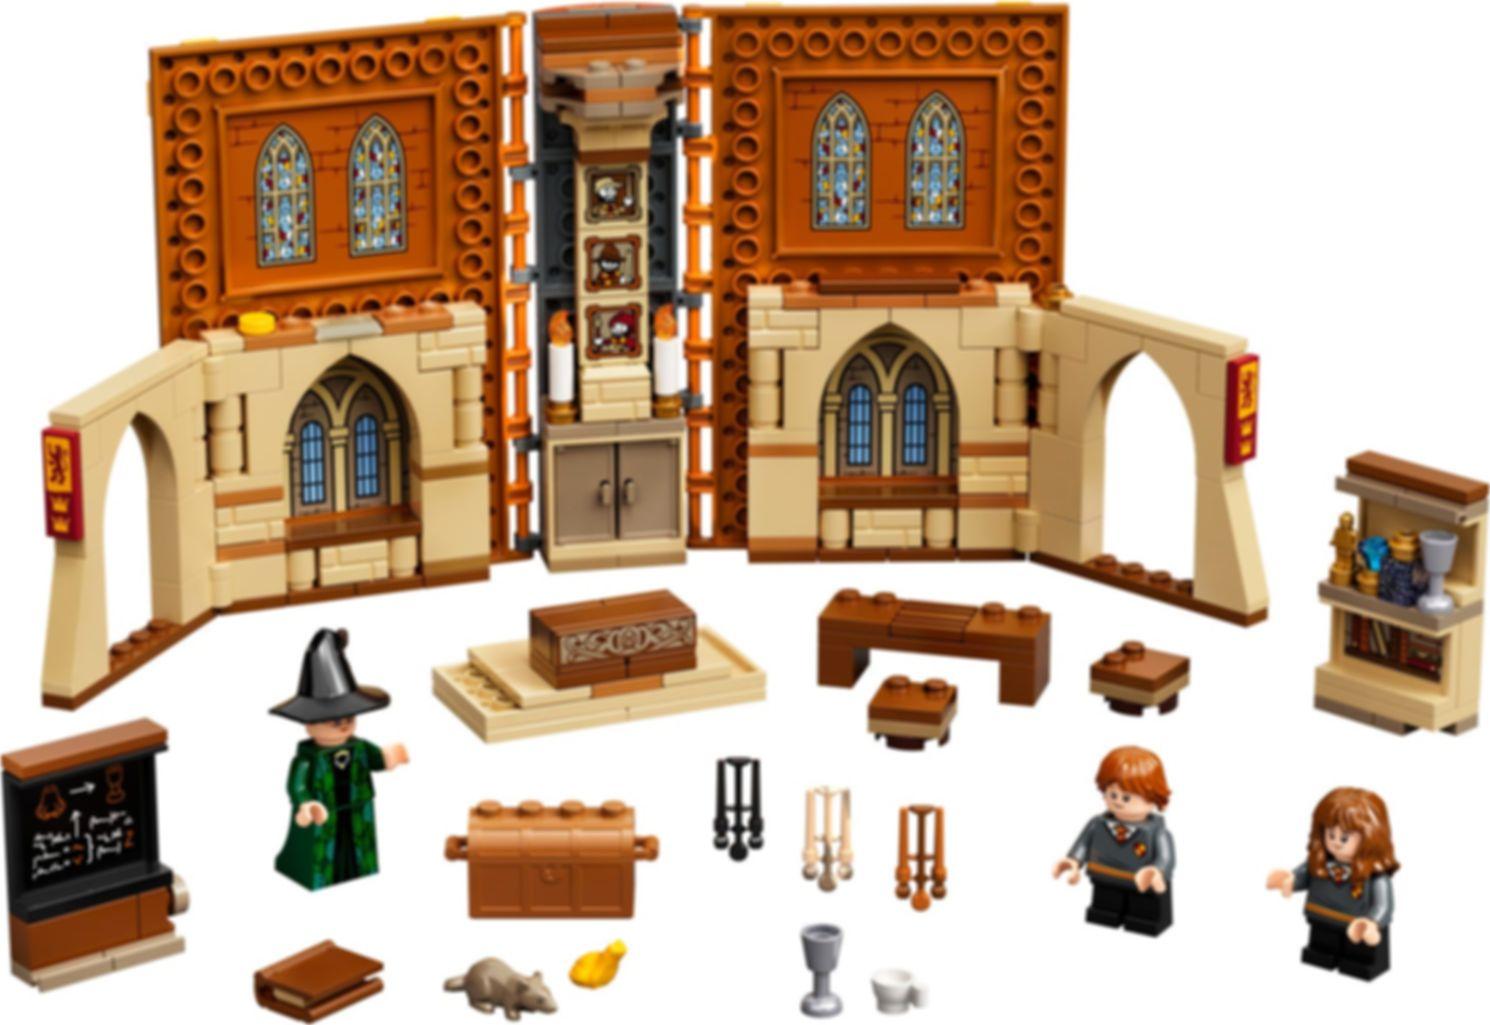 Hogwarts™ Moment: Transfiguration Class components